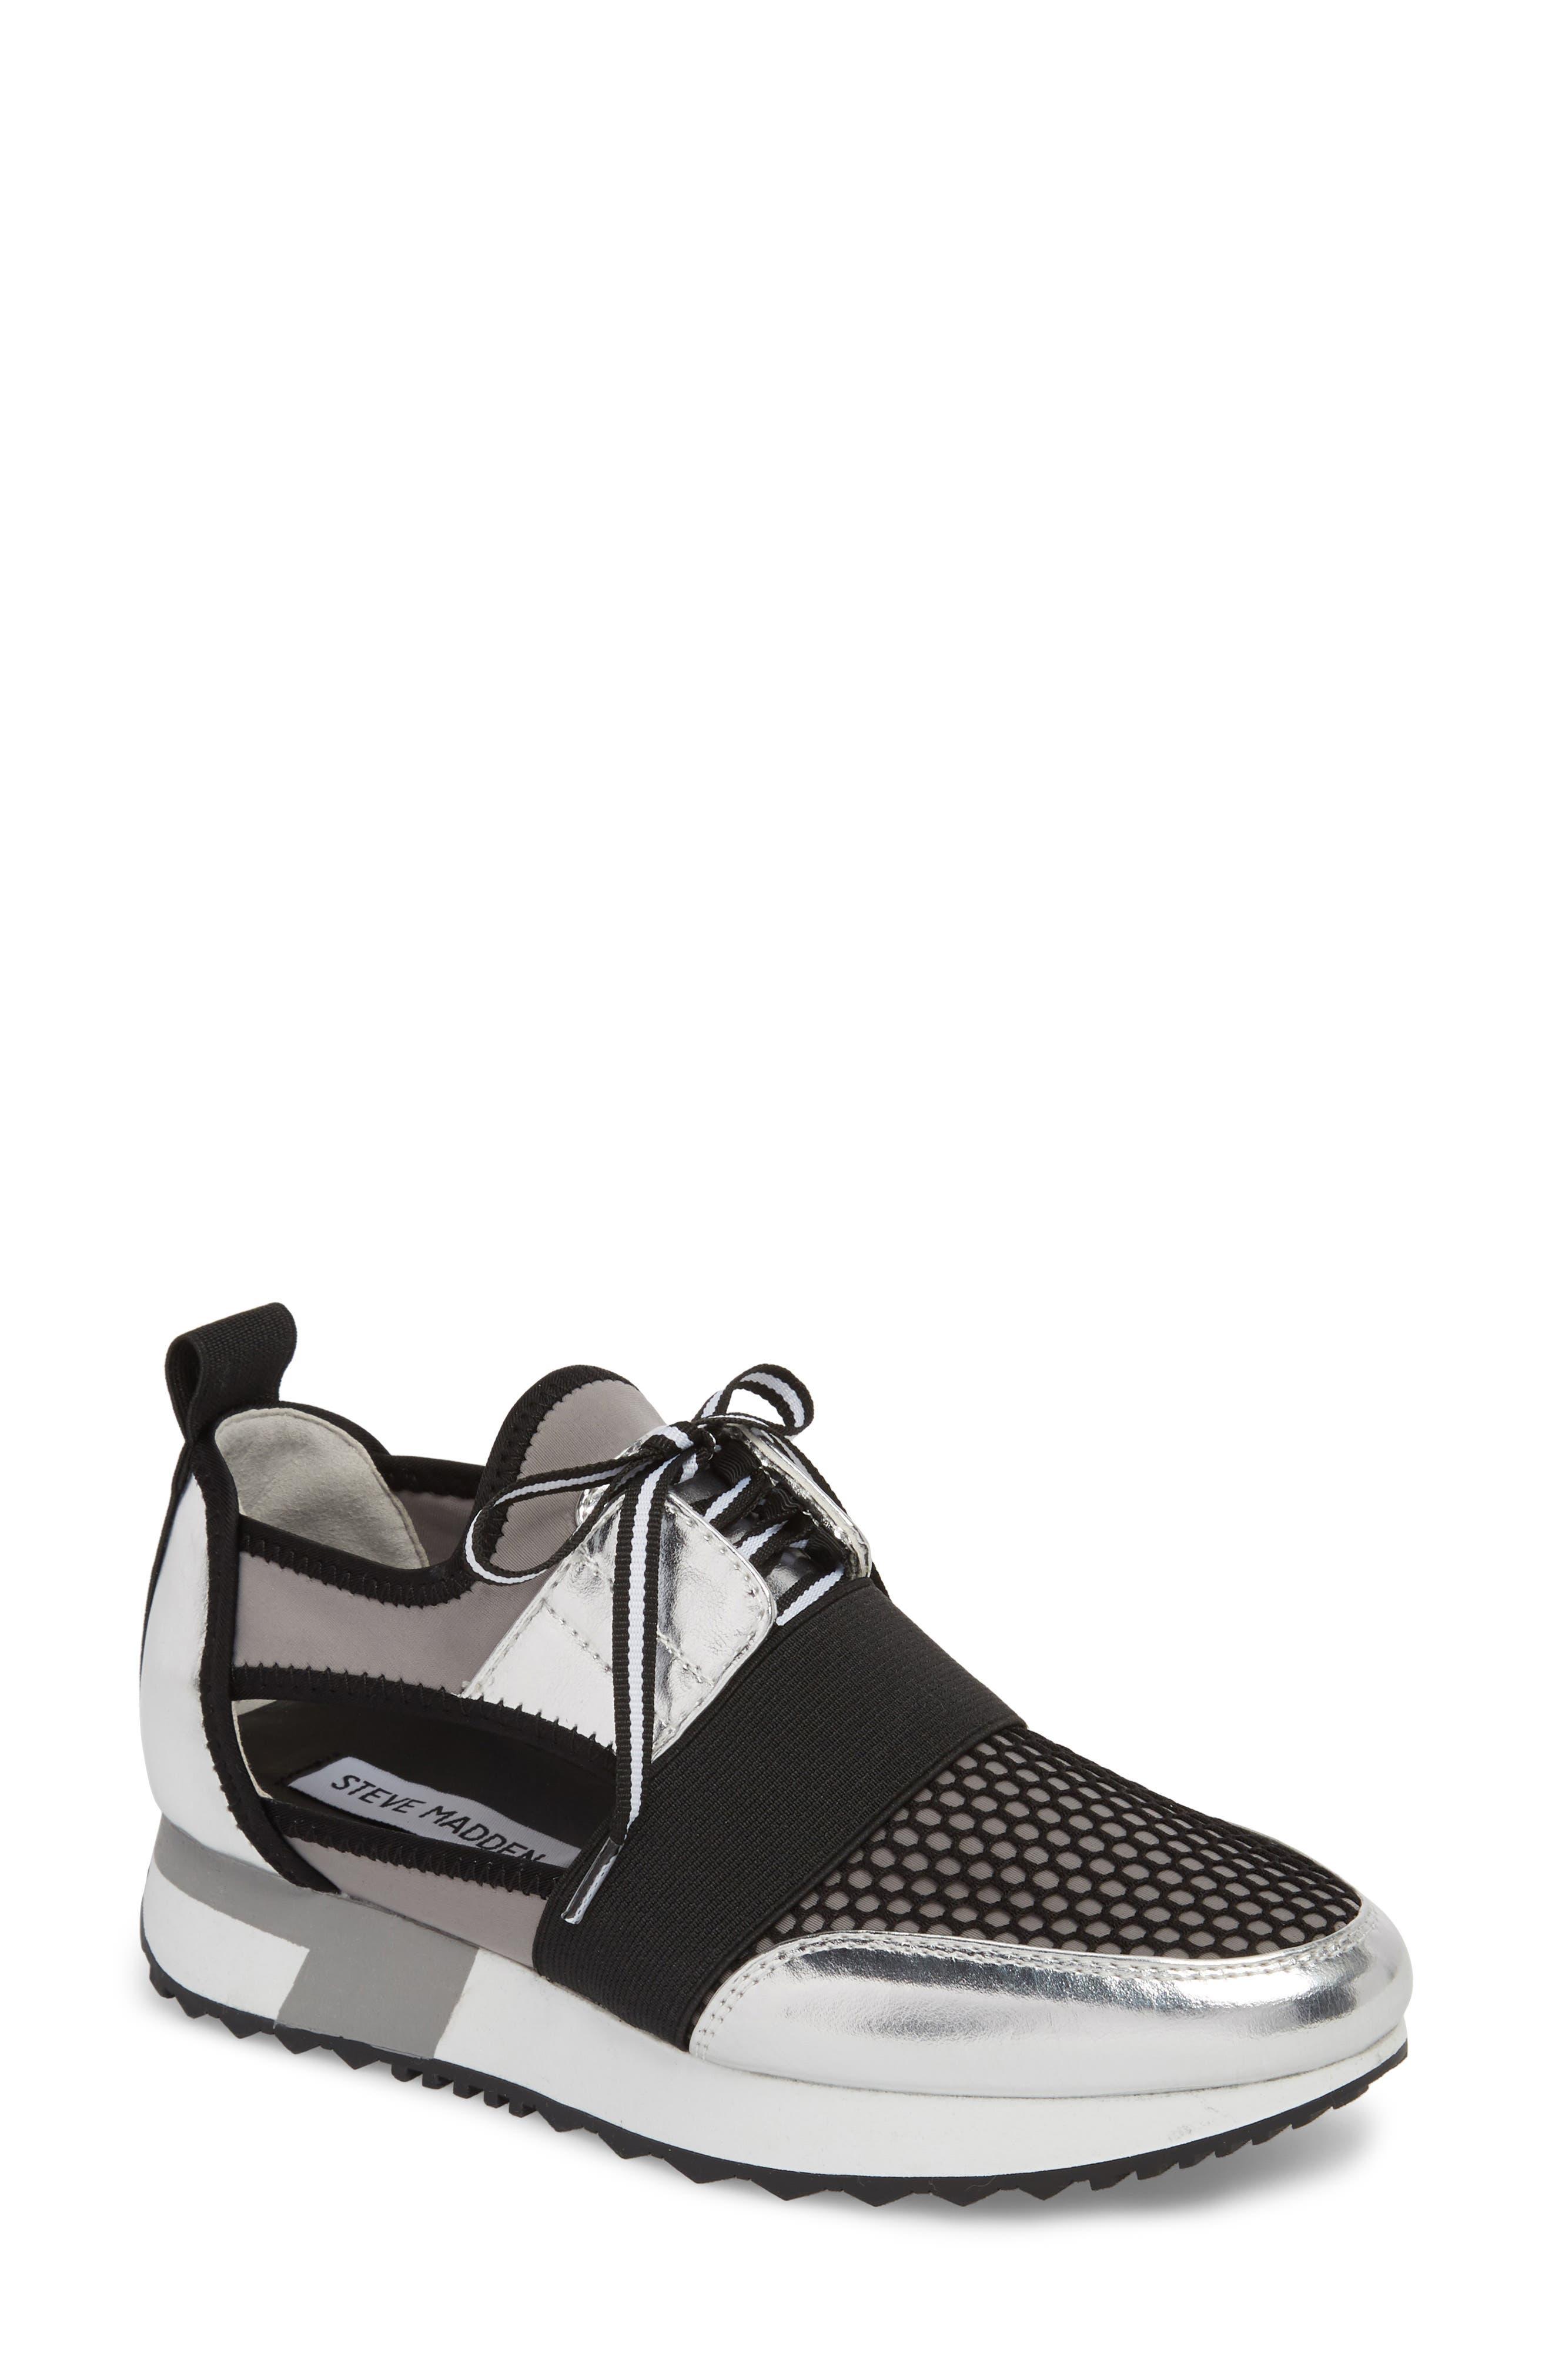 Arctic Sneaker,                             Main thumbnail 1, color,                             SILVER MULTI